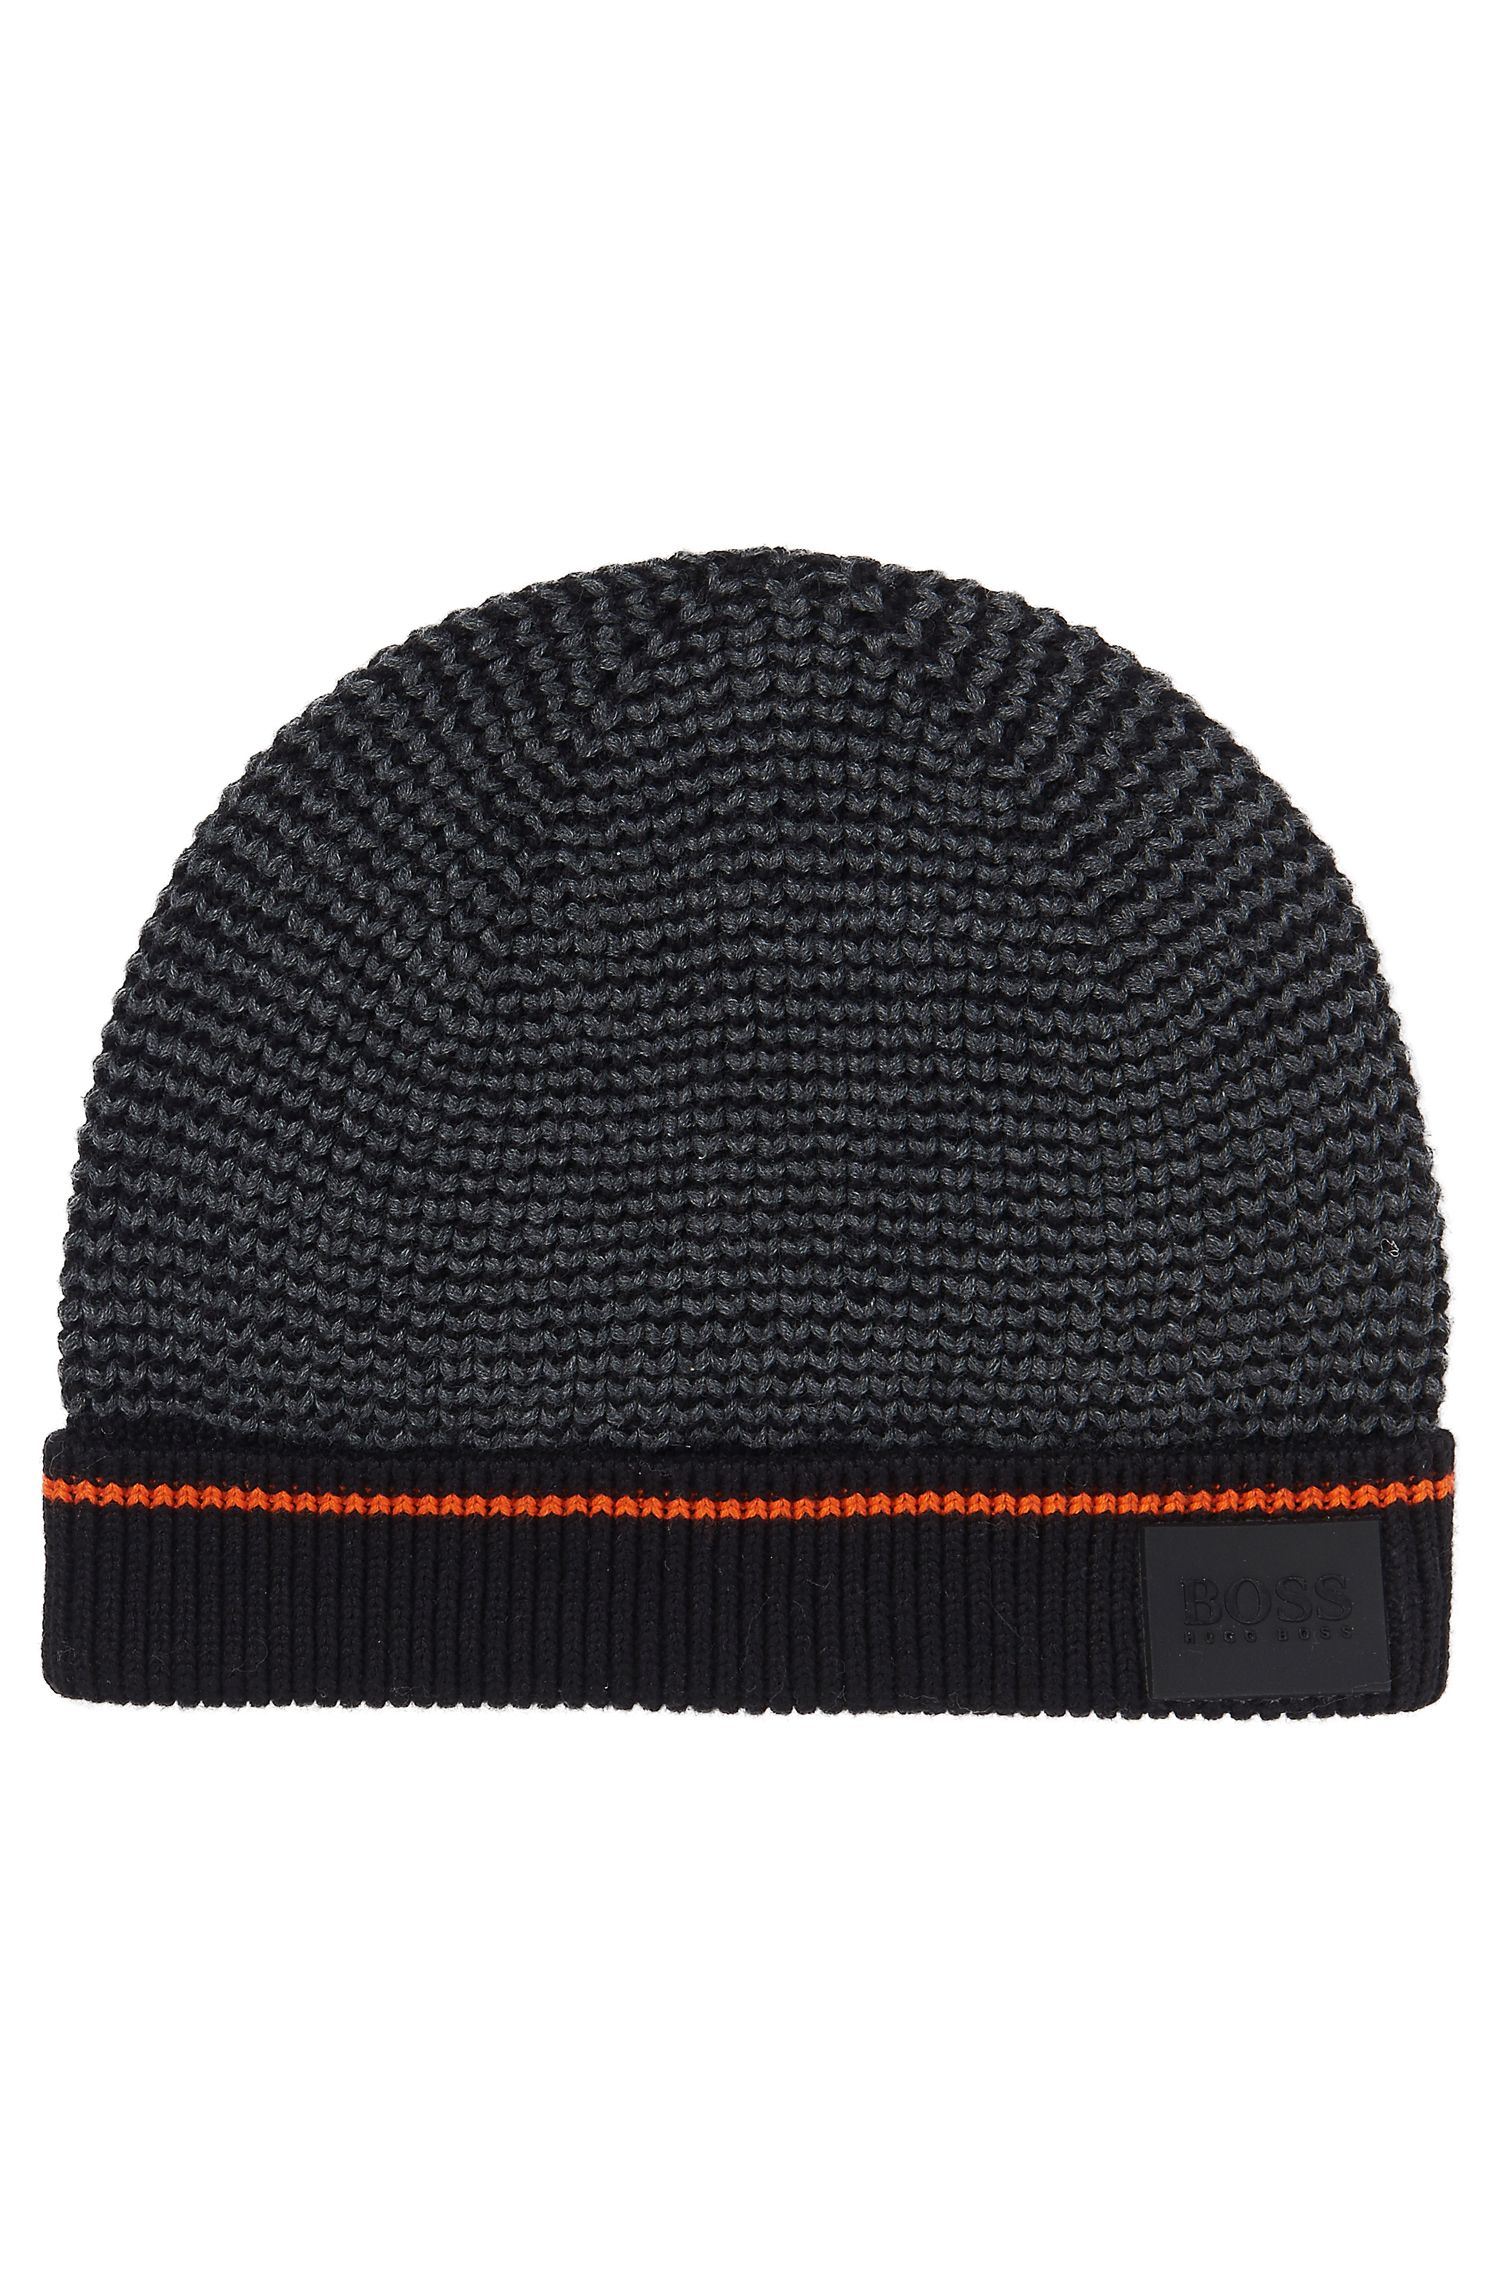 'J21174' | Boys Cotton Knit Beanie